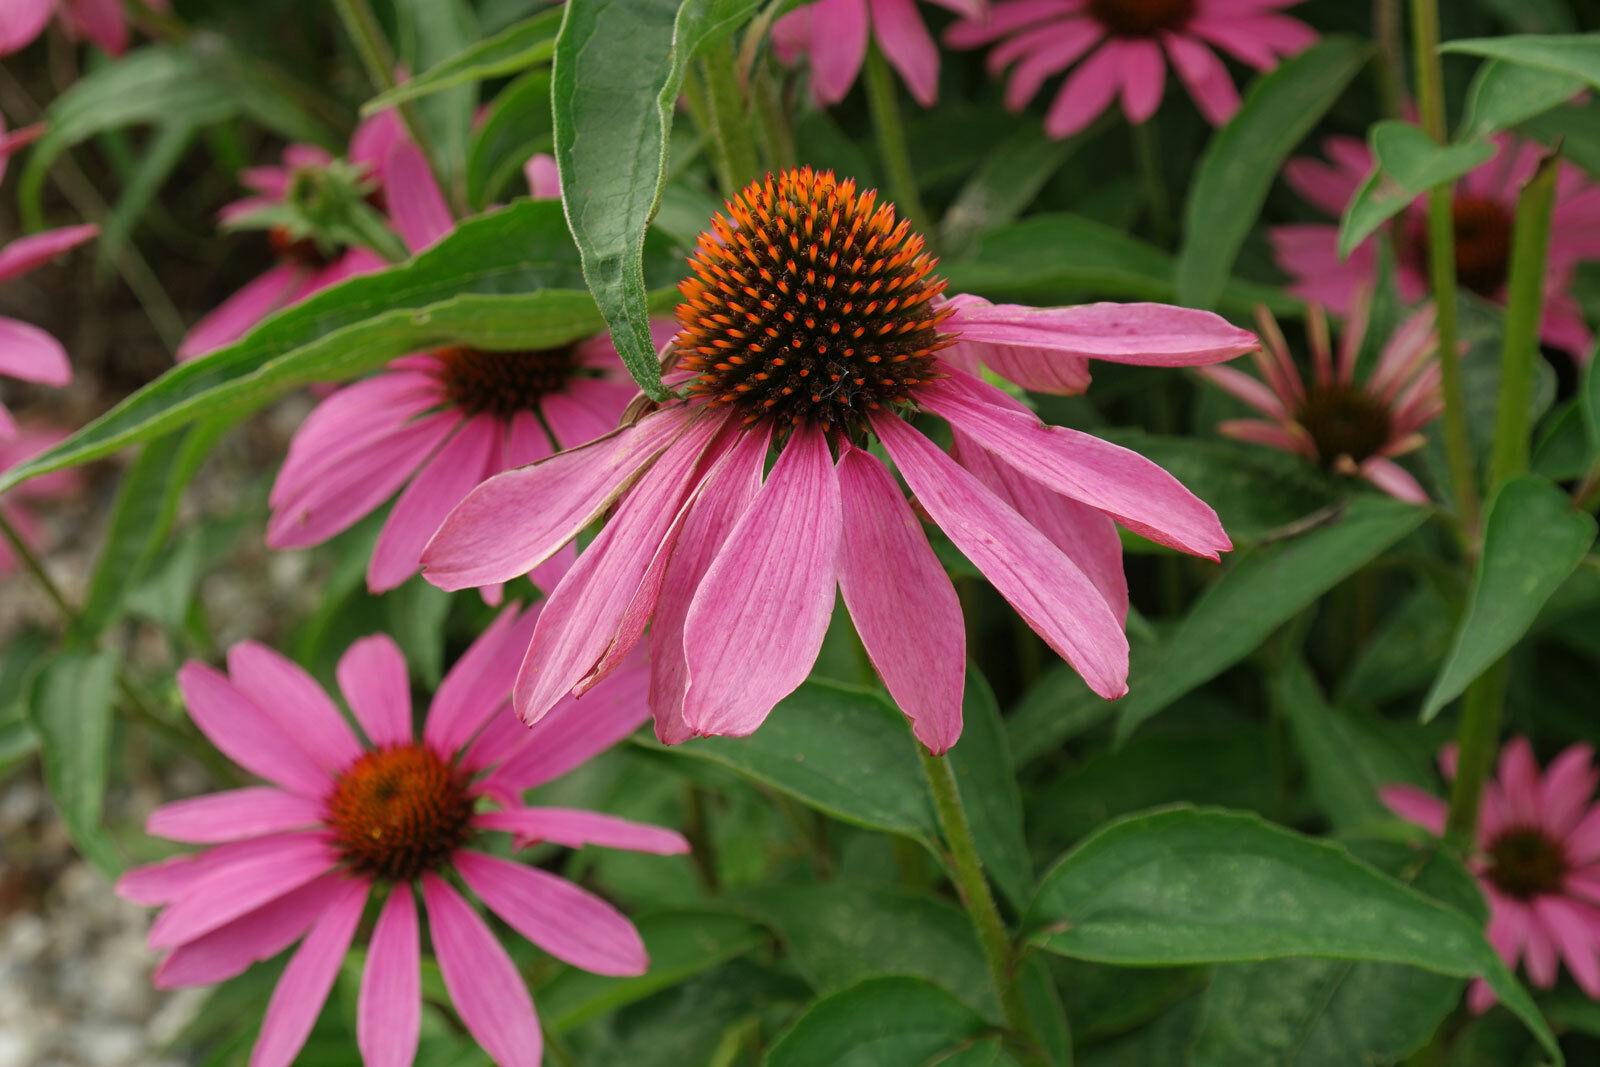 ECHINACEA PURPUREA HERB SEEDS Medicinal and Beautiful Wildflower